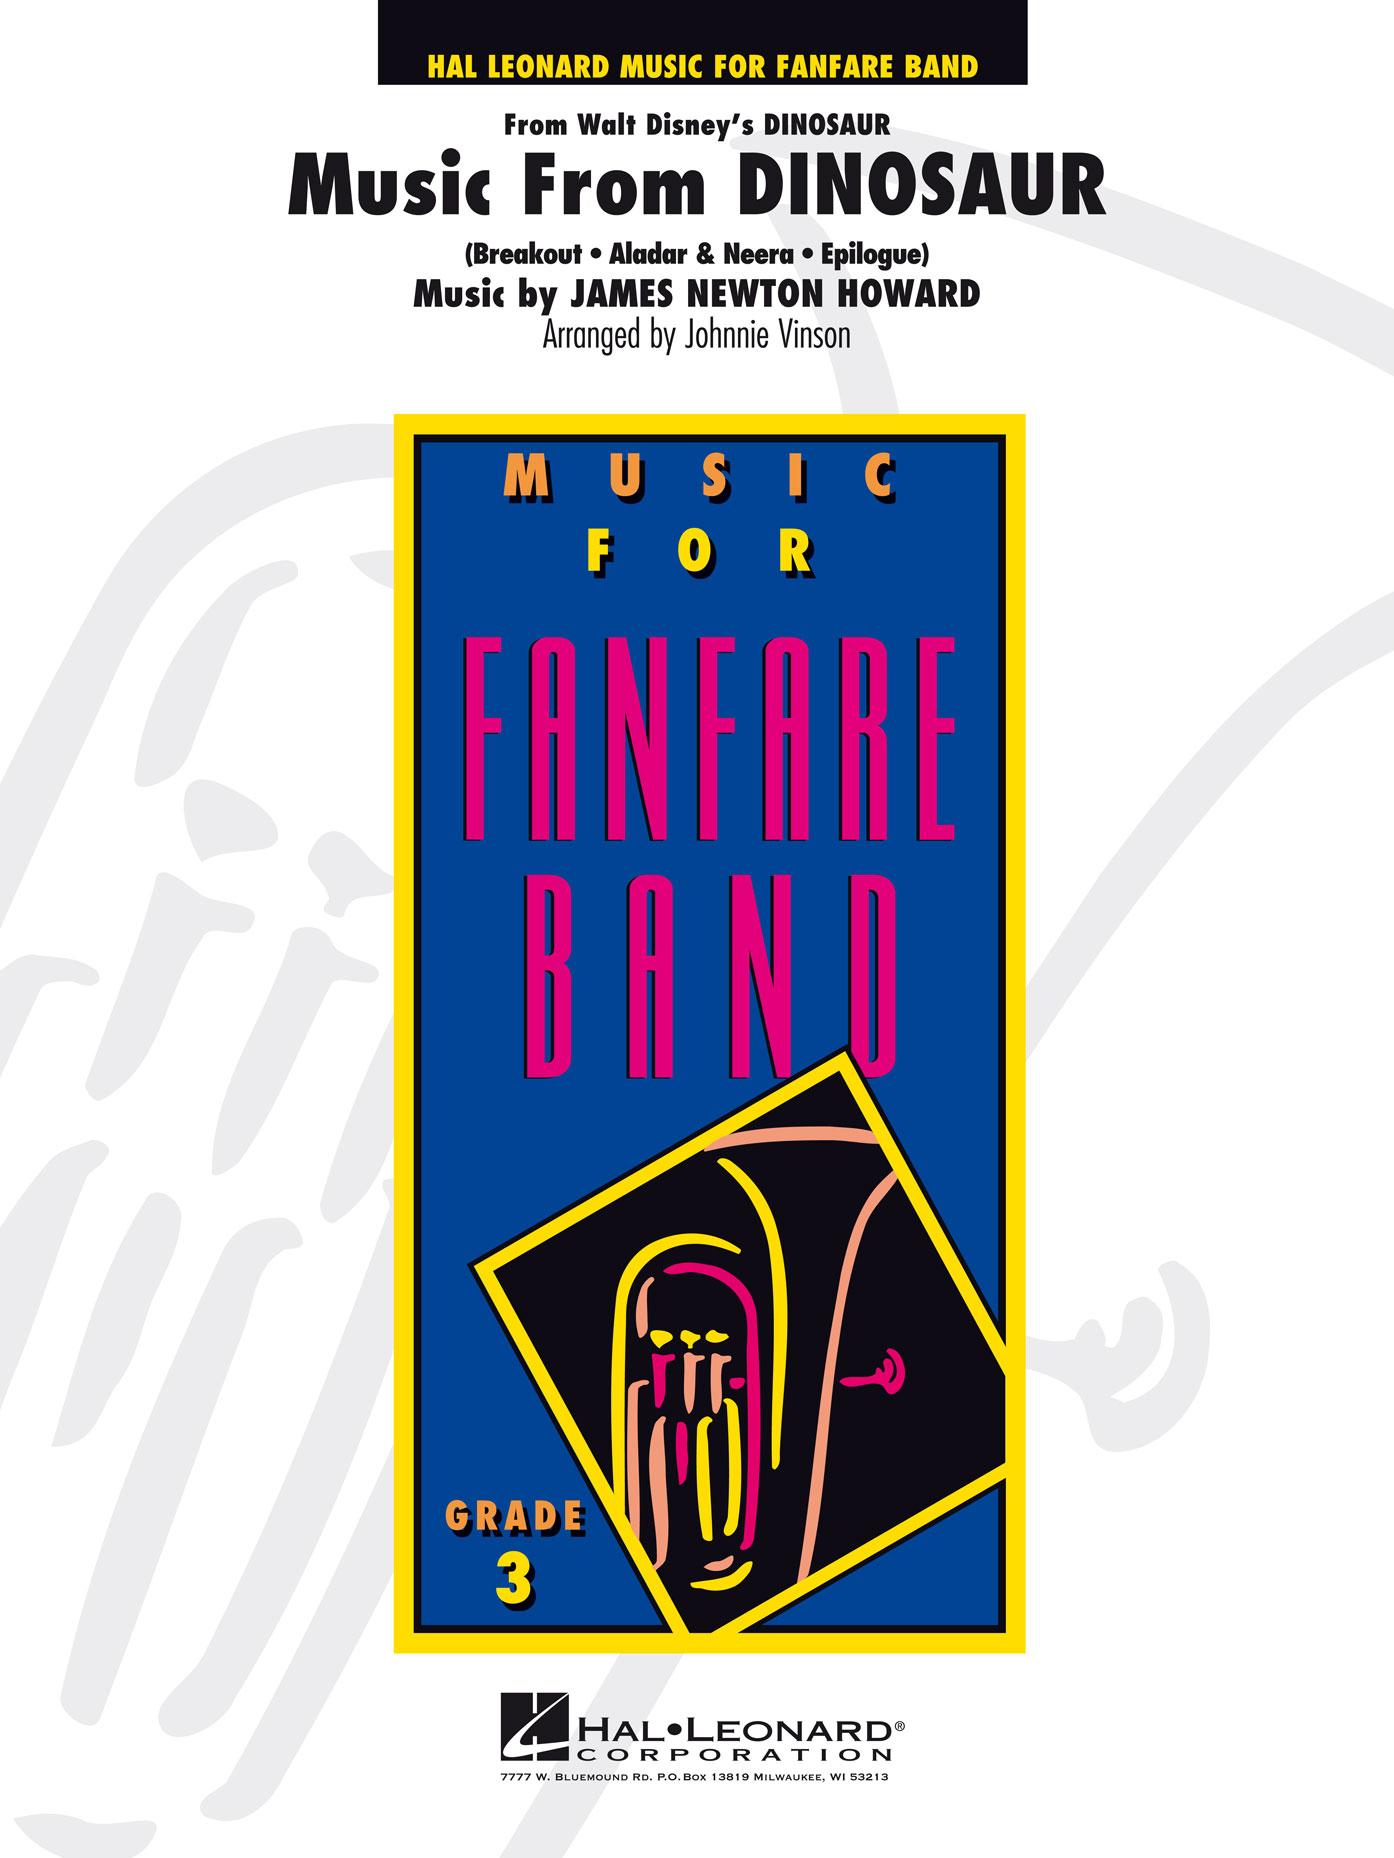 James Newton Howard: Music From Dinosaur: Fanfare Band: Score